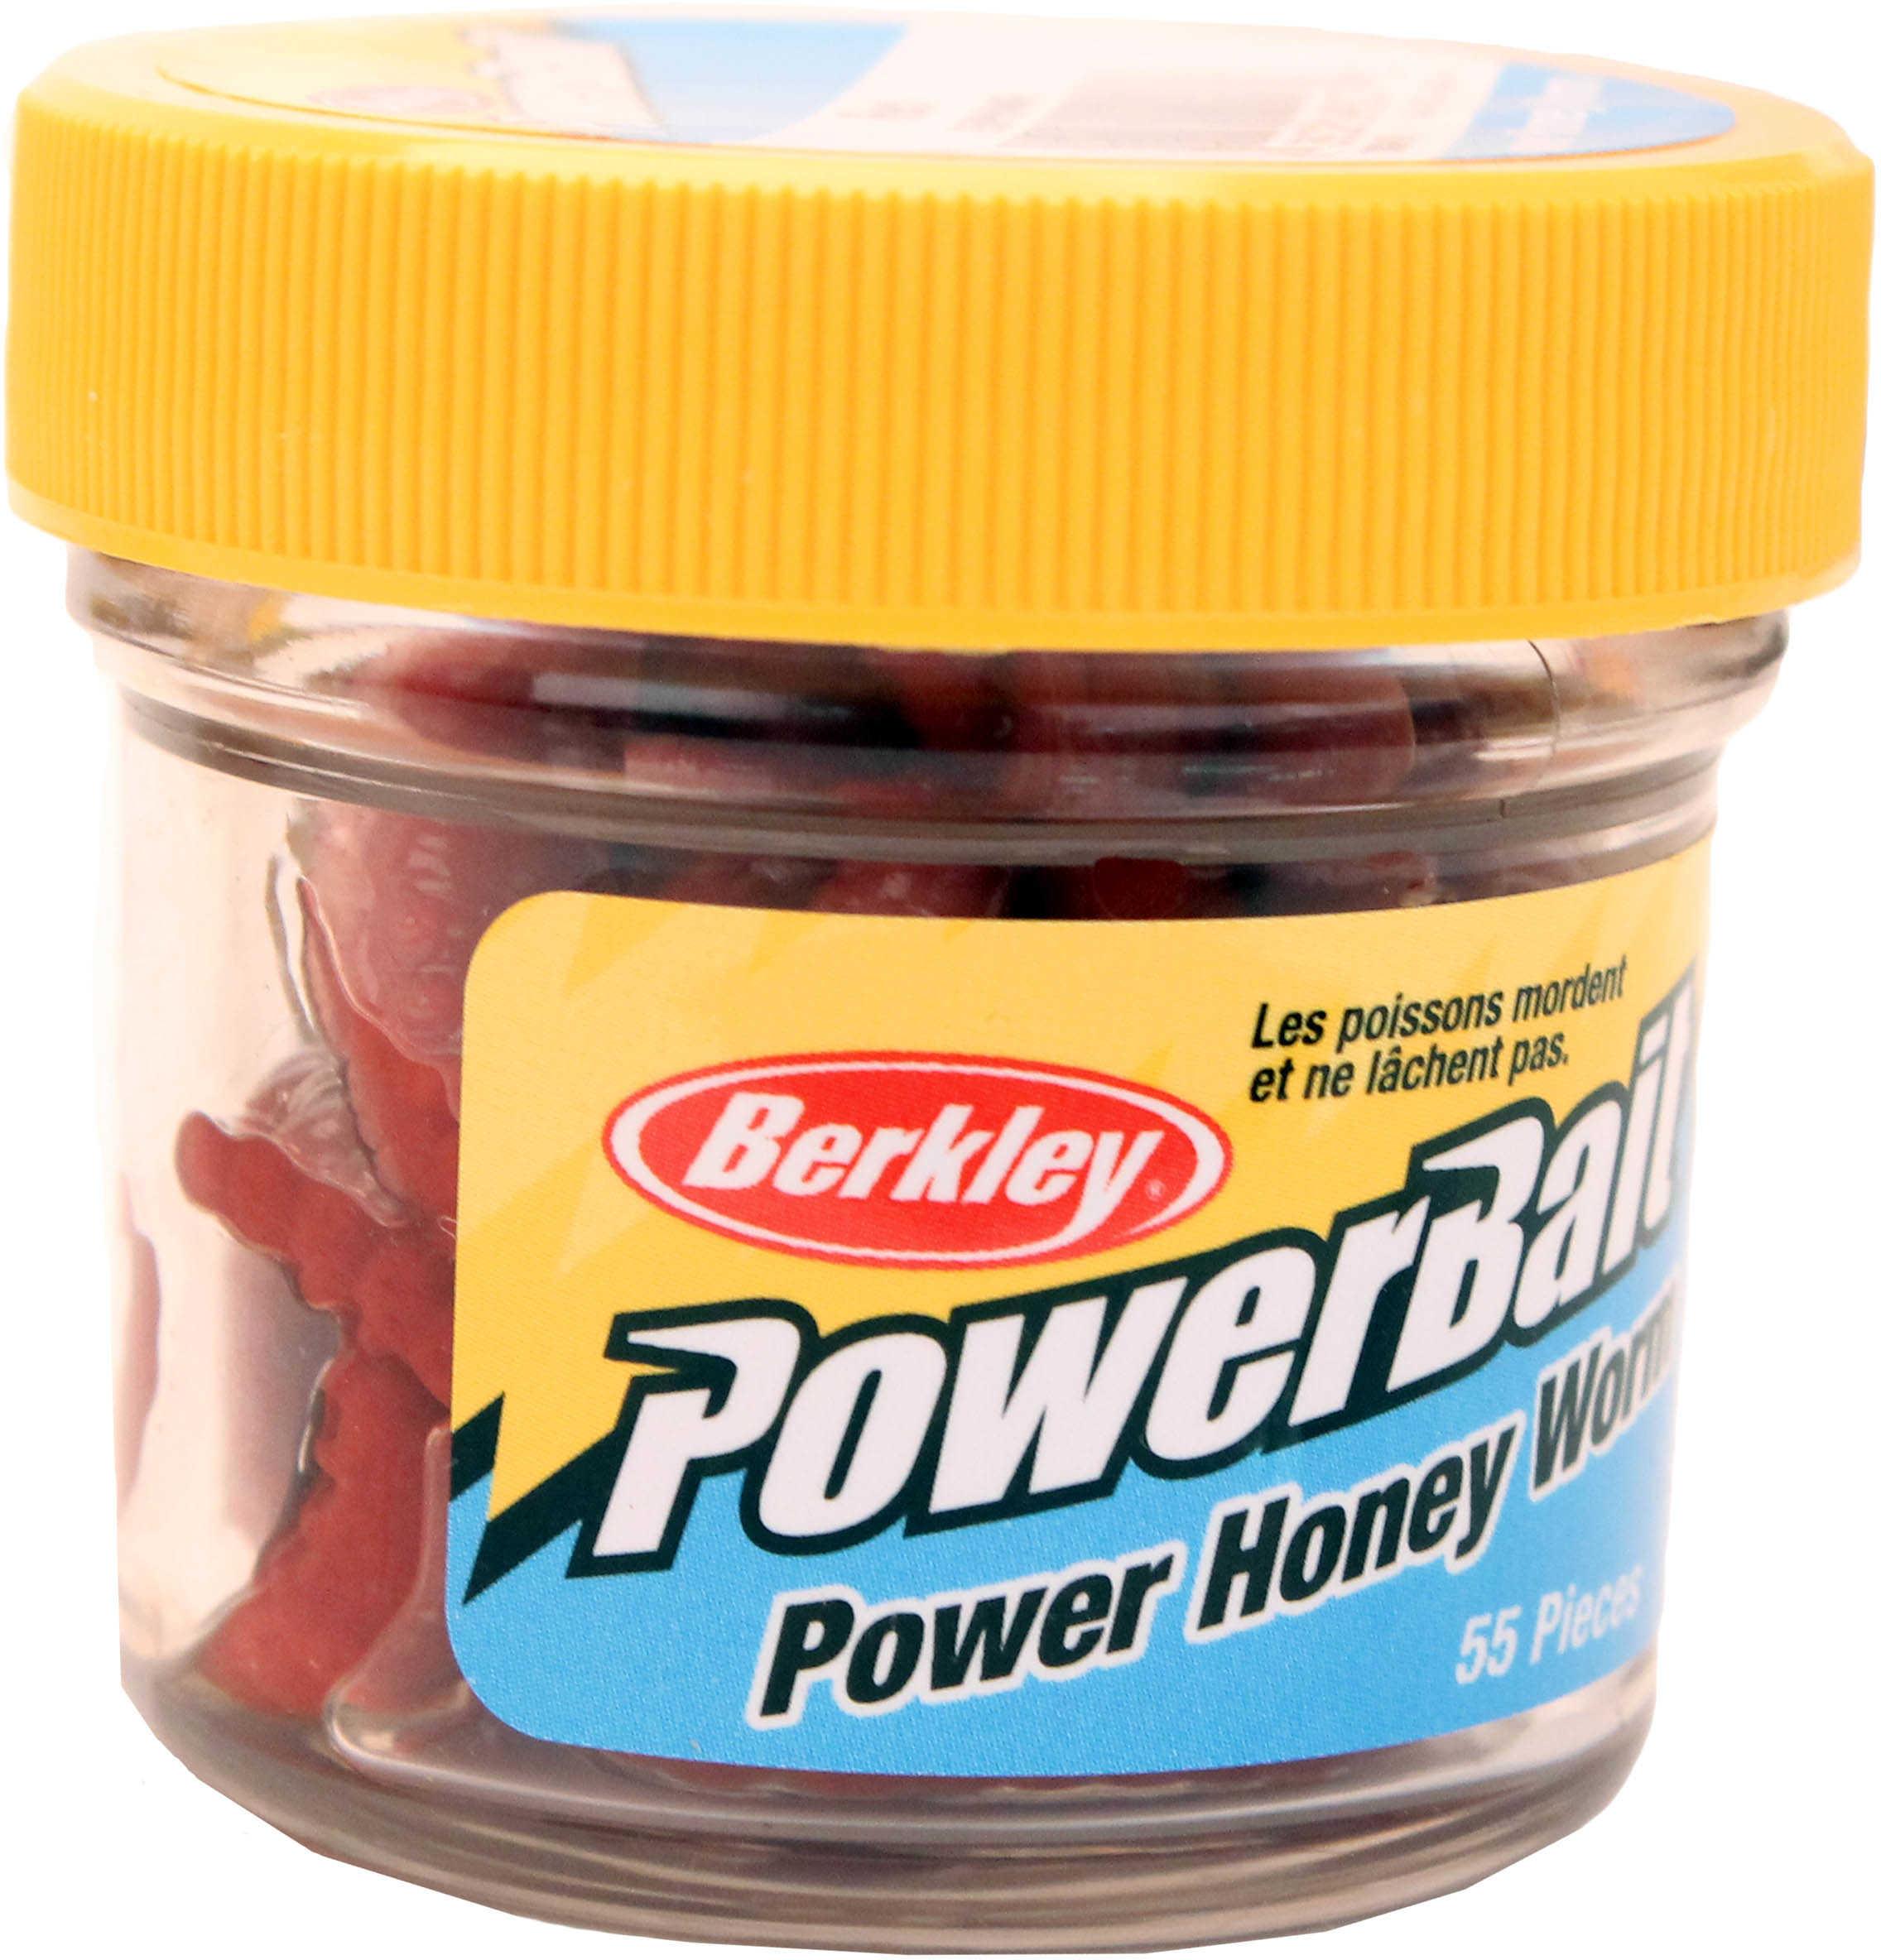 Berkley Power Honey Worm Jar Red Md#: EBPHWR